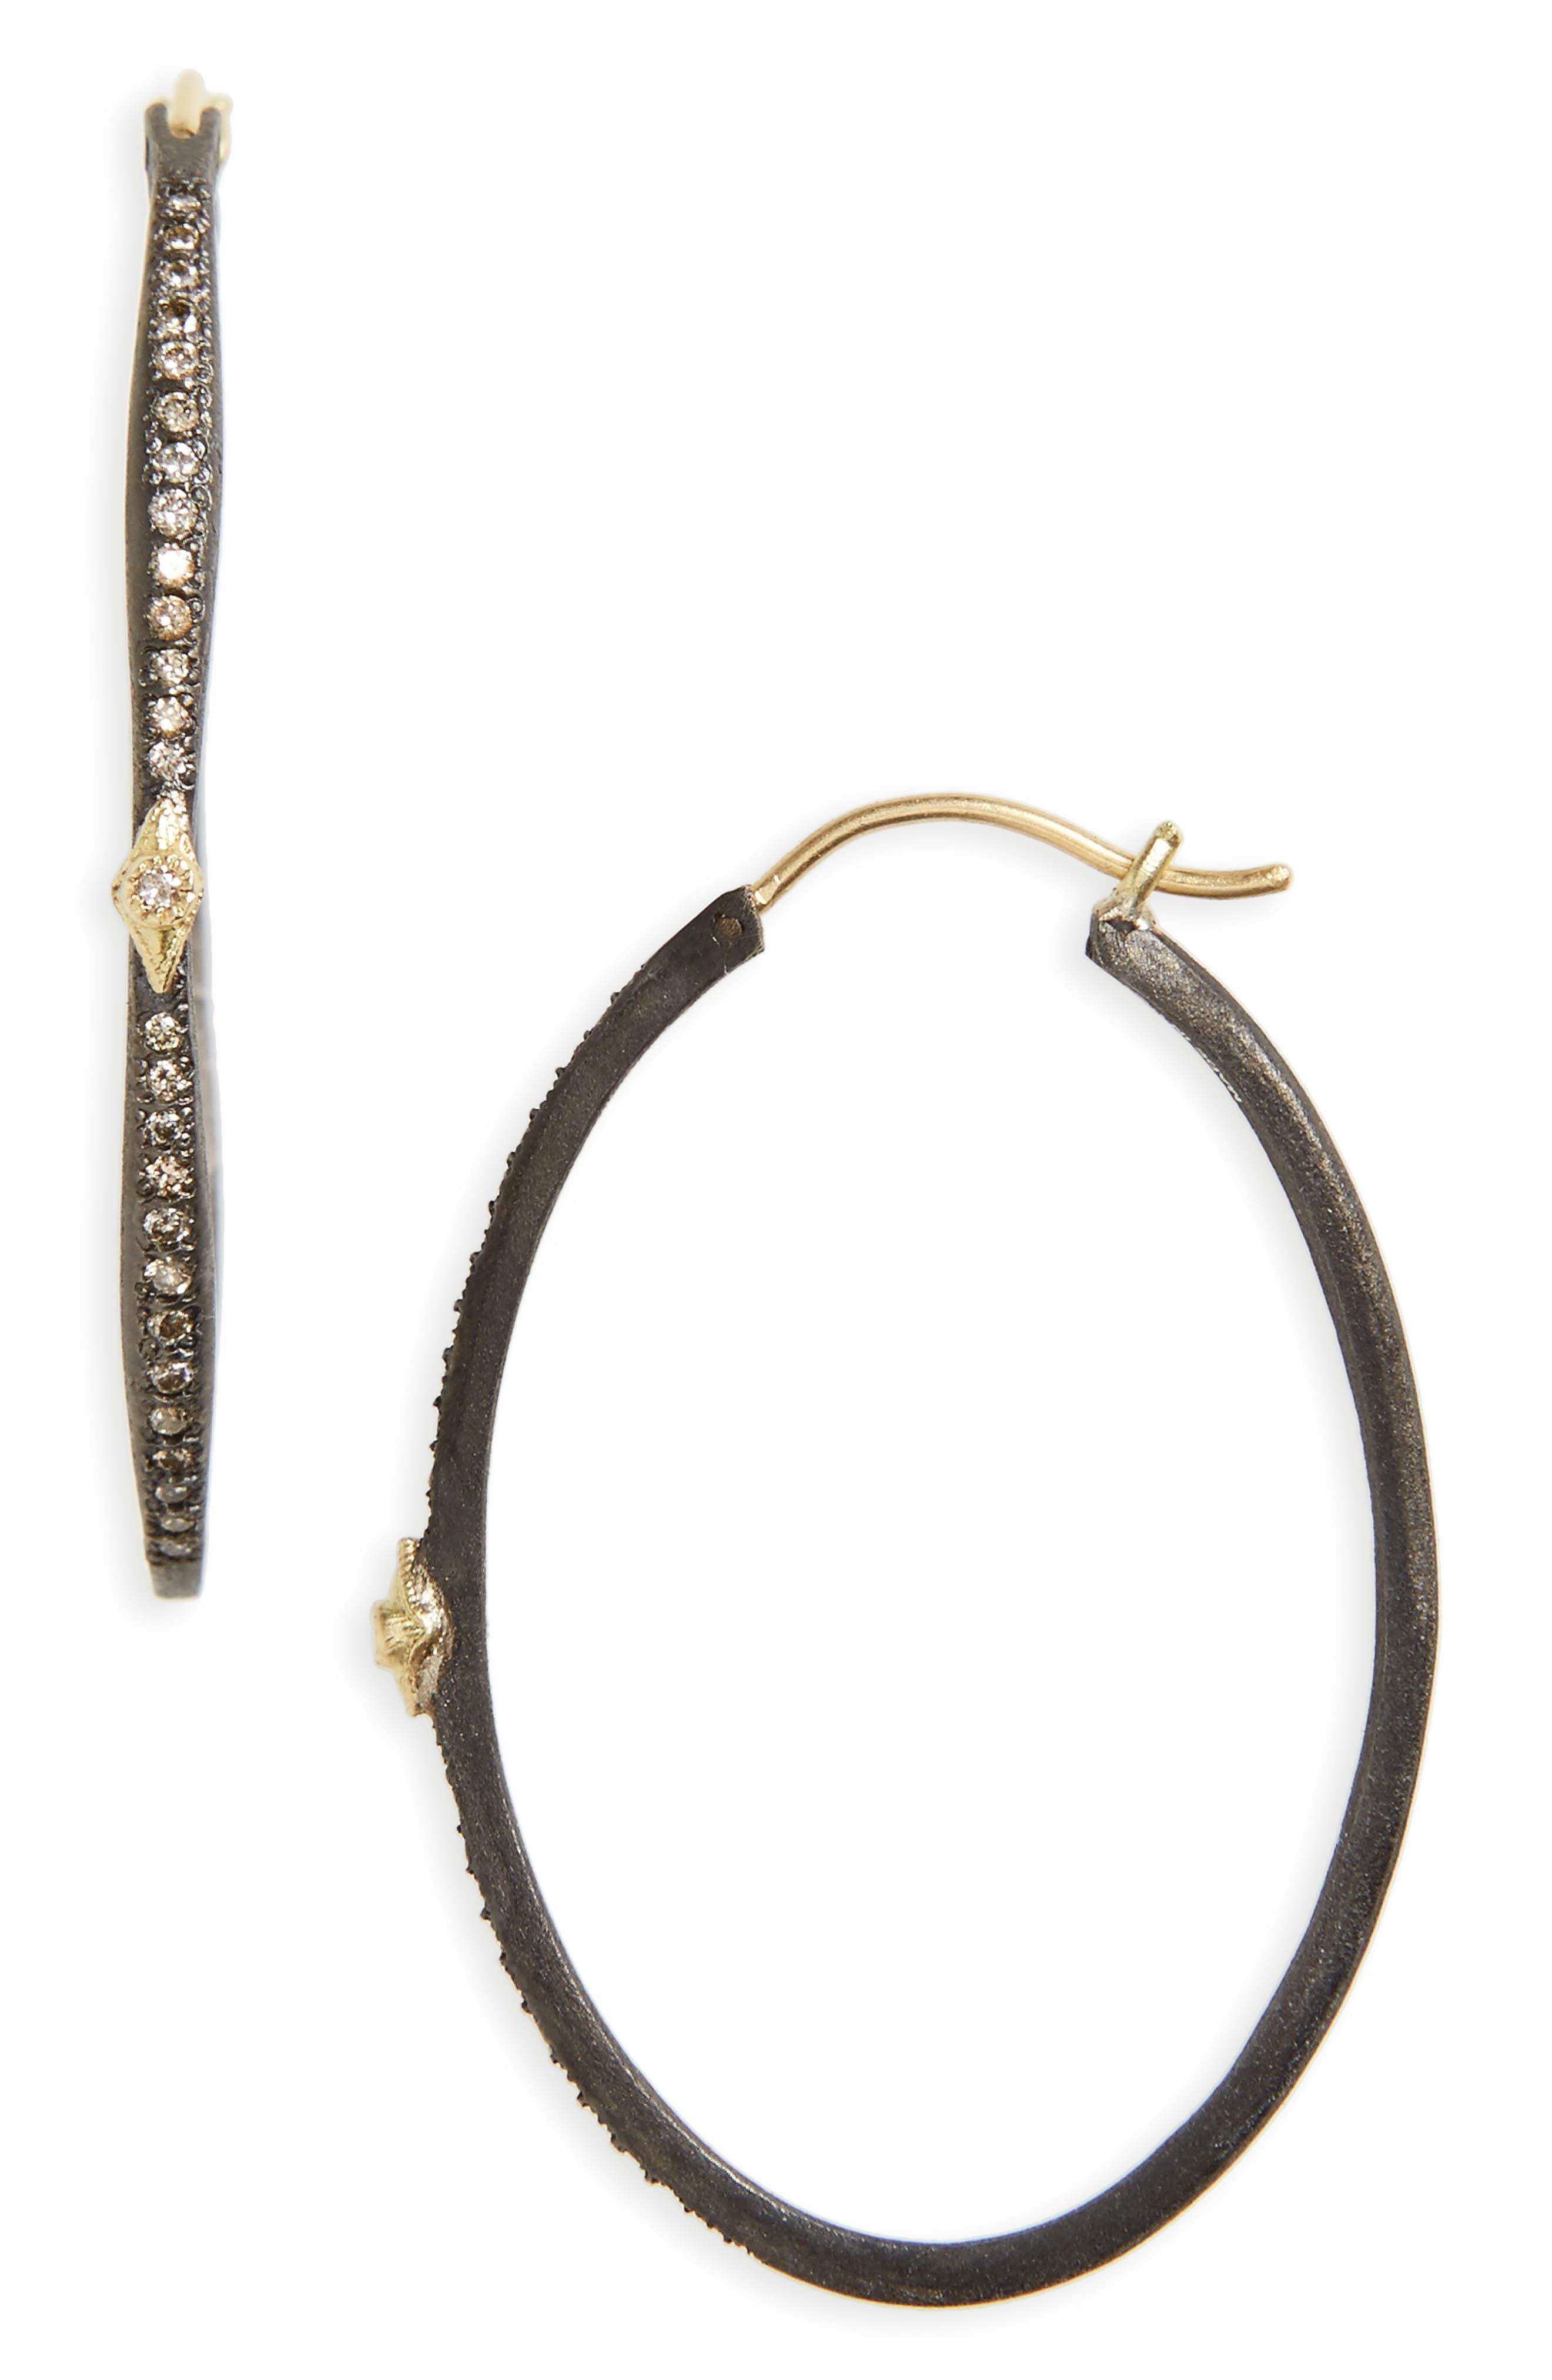 Old World Oval Hoop Earrings,                             Main thumbnail 1, color,                             BLACKENED SILVER